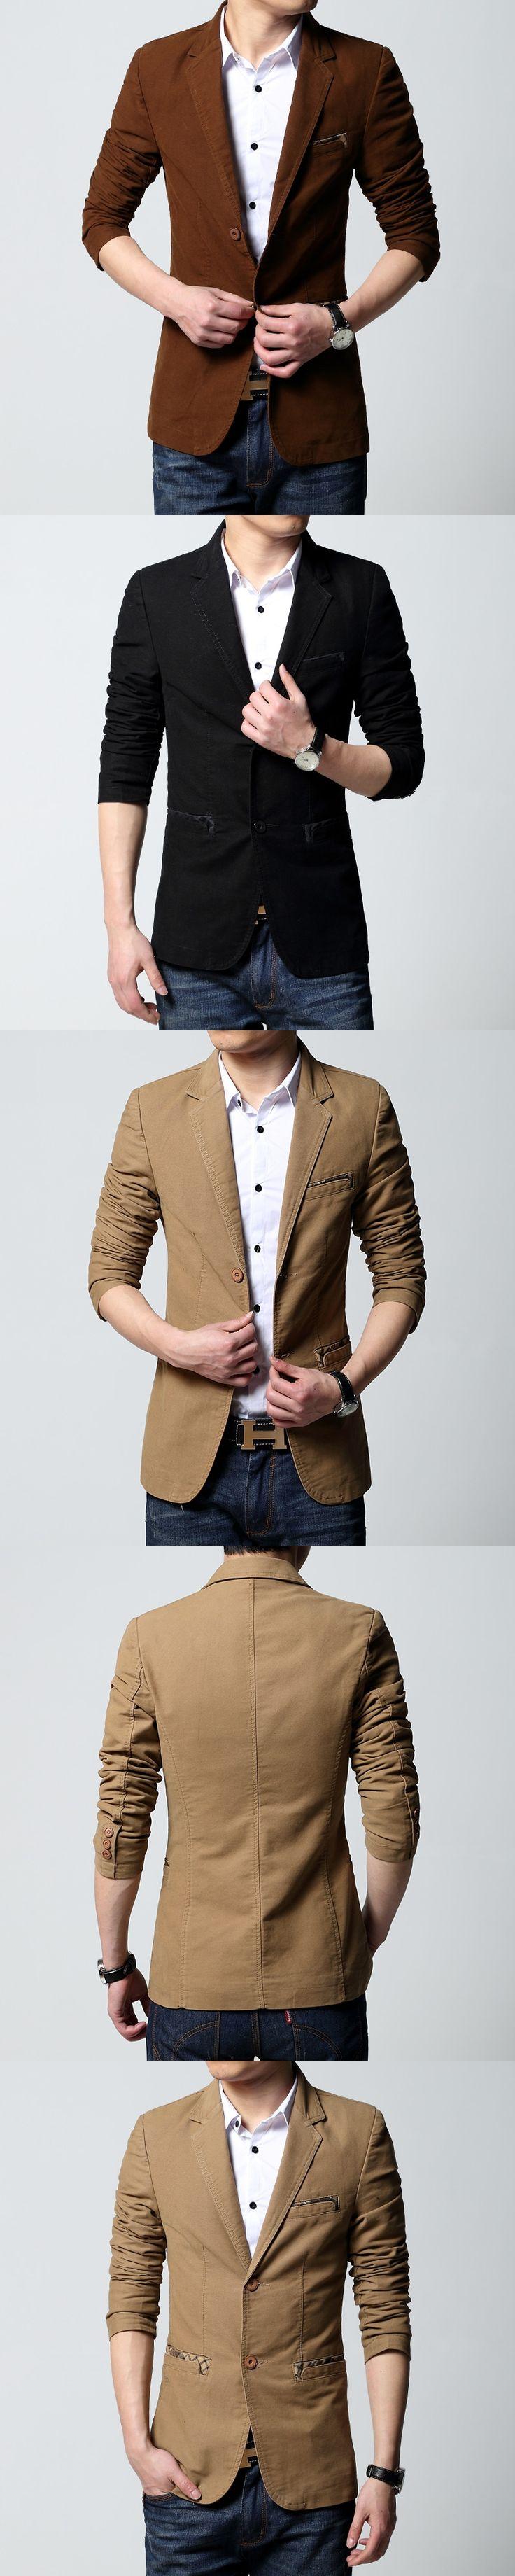 Mens casual blazer and jacket new korean fashion style black khaki brown slim fit hot sale Male coat plus size big 6XL drop ship